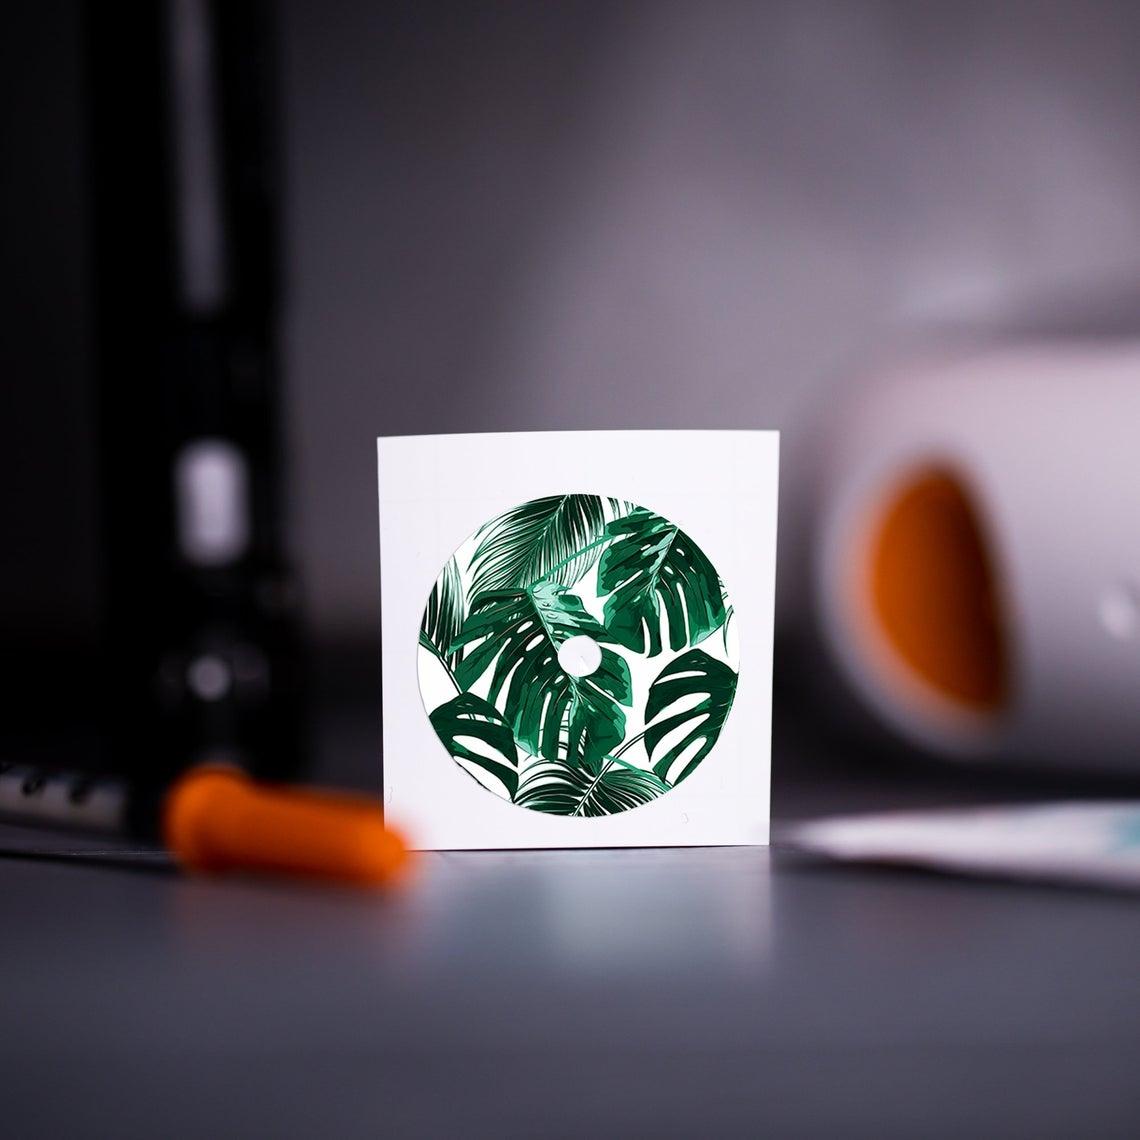 Diafin > FreeStyle Libre Sensor Stickers